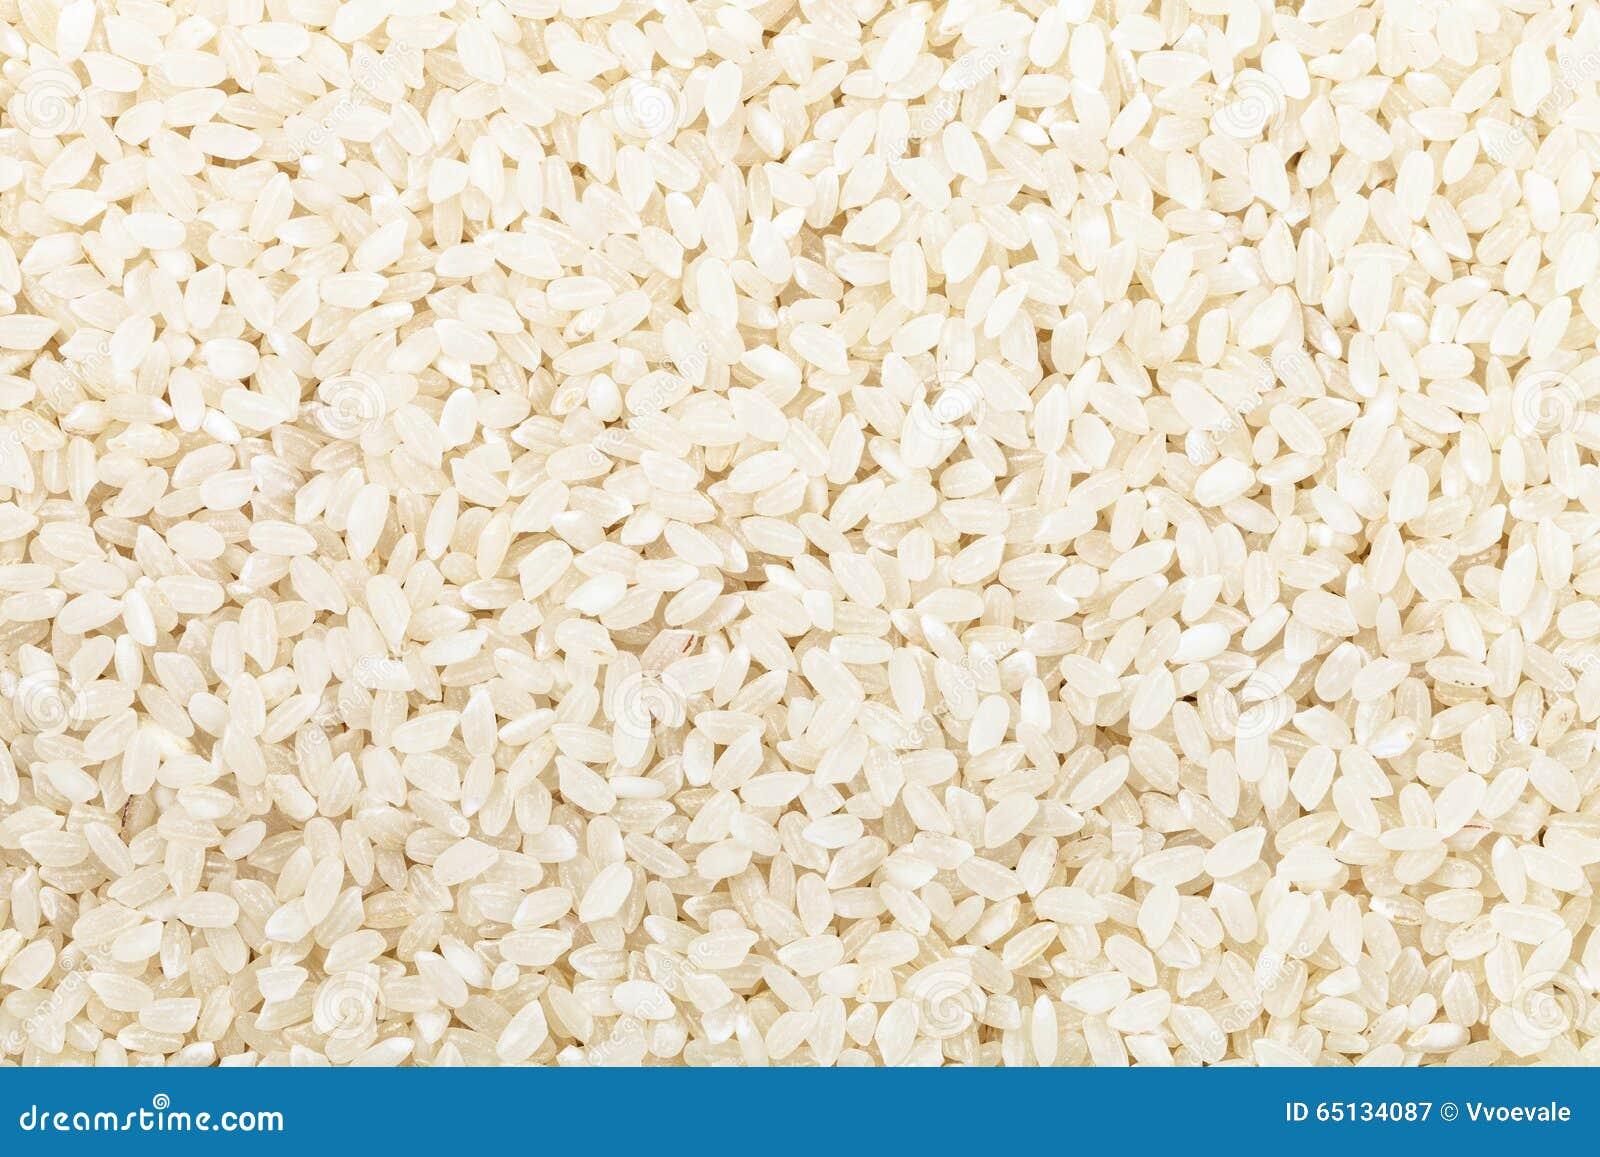 Dieta de la pasta y arroz blanco